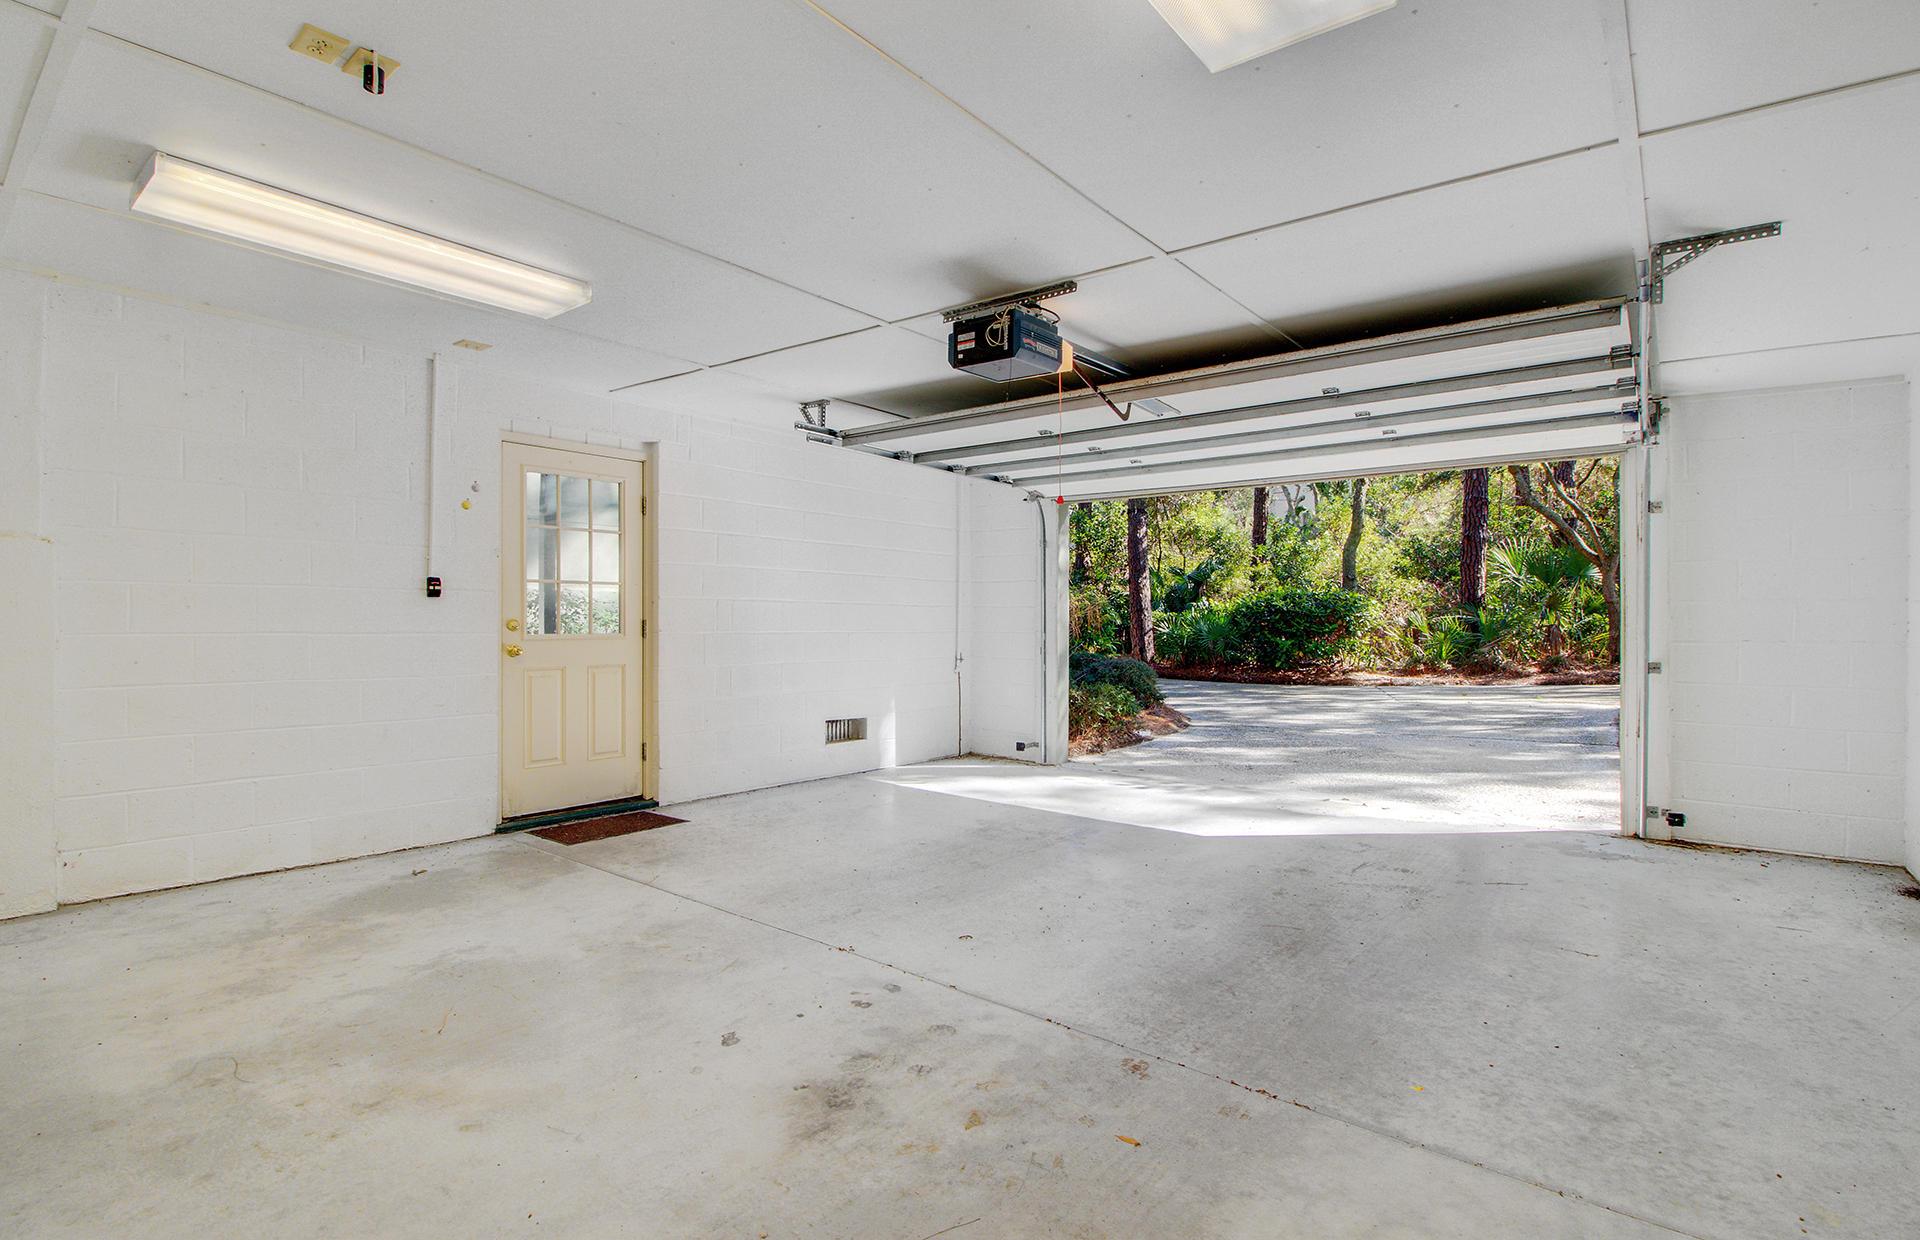 Kiawah Island Homes For Sale - 402 Ocean Oaks, Kiawah Island, SC - 11